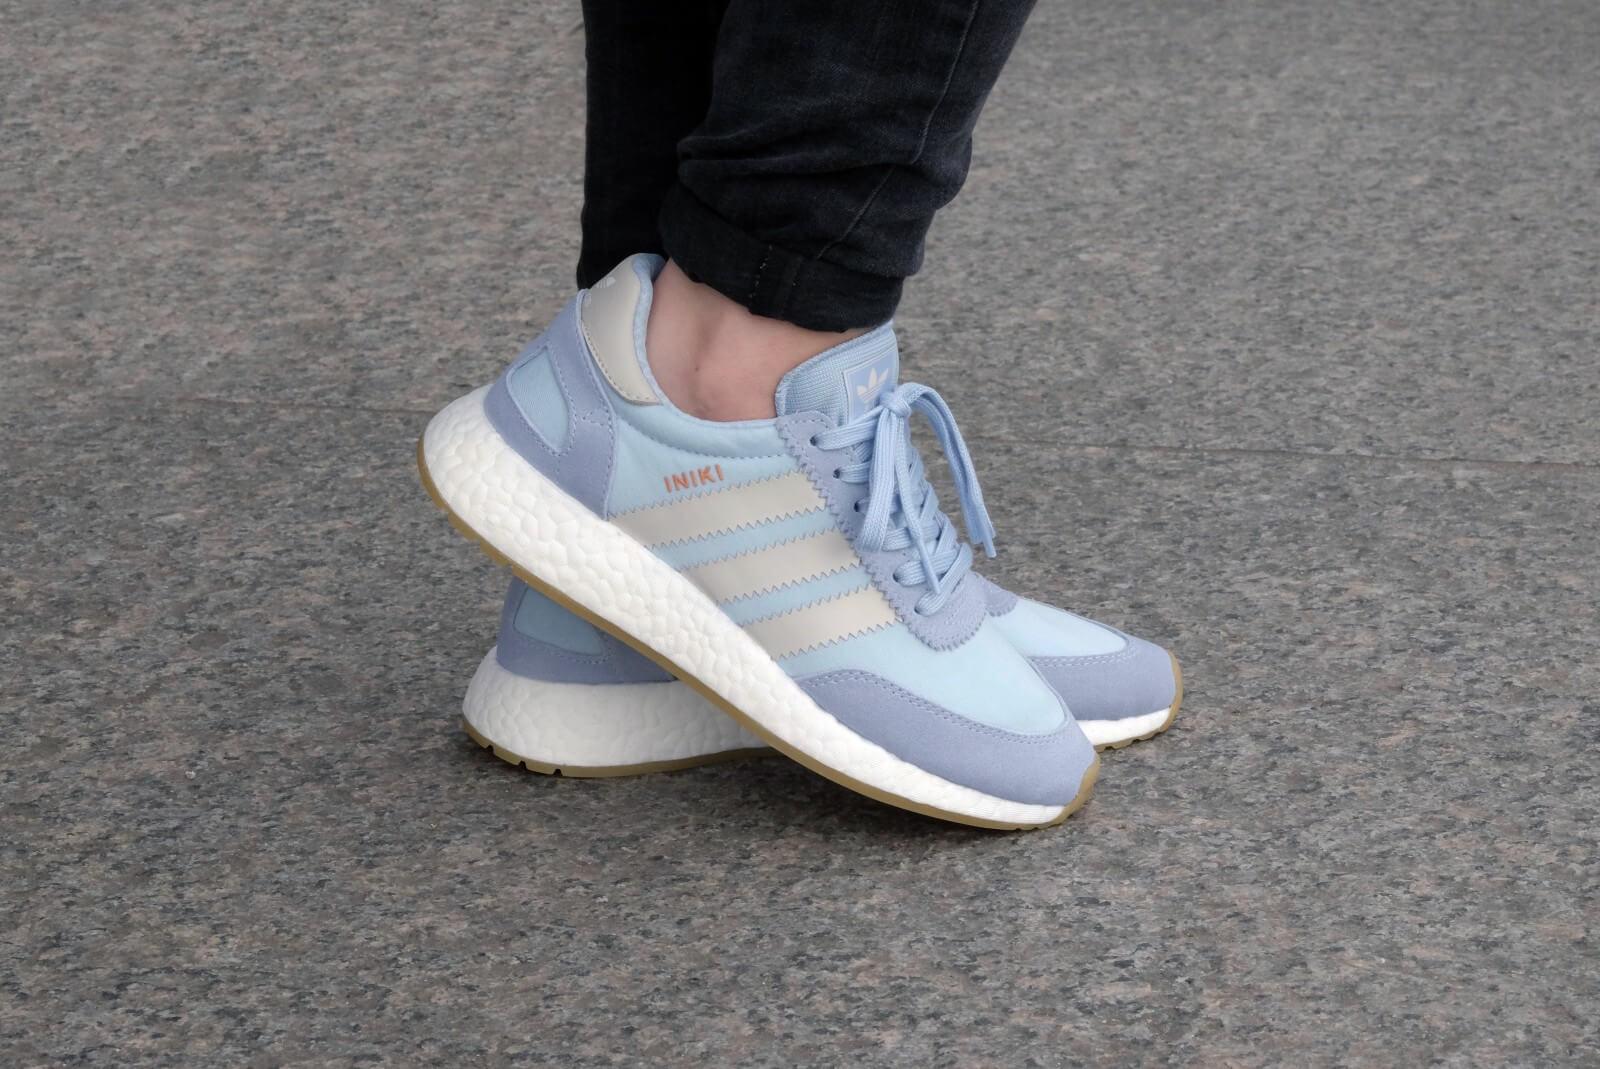 Adidas Iniki Runner Easy Blue/Pearl